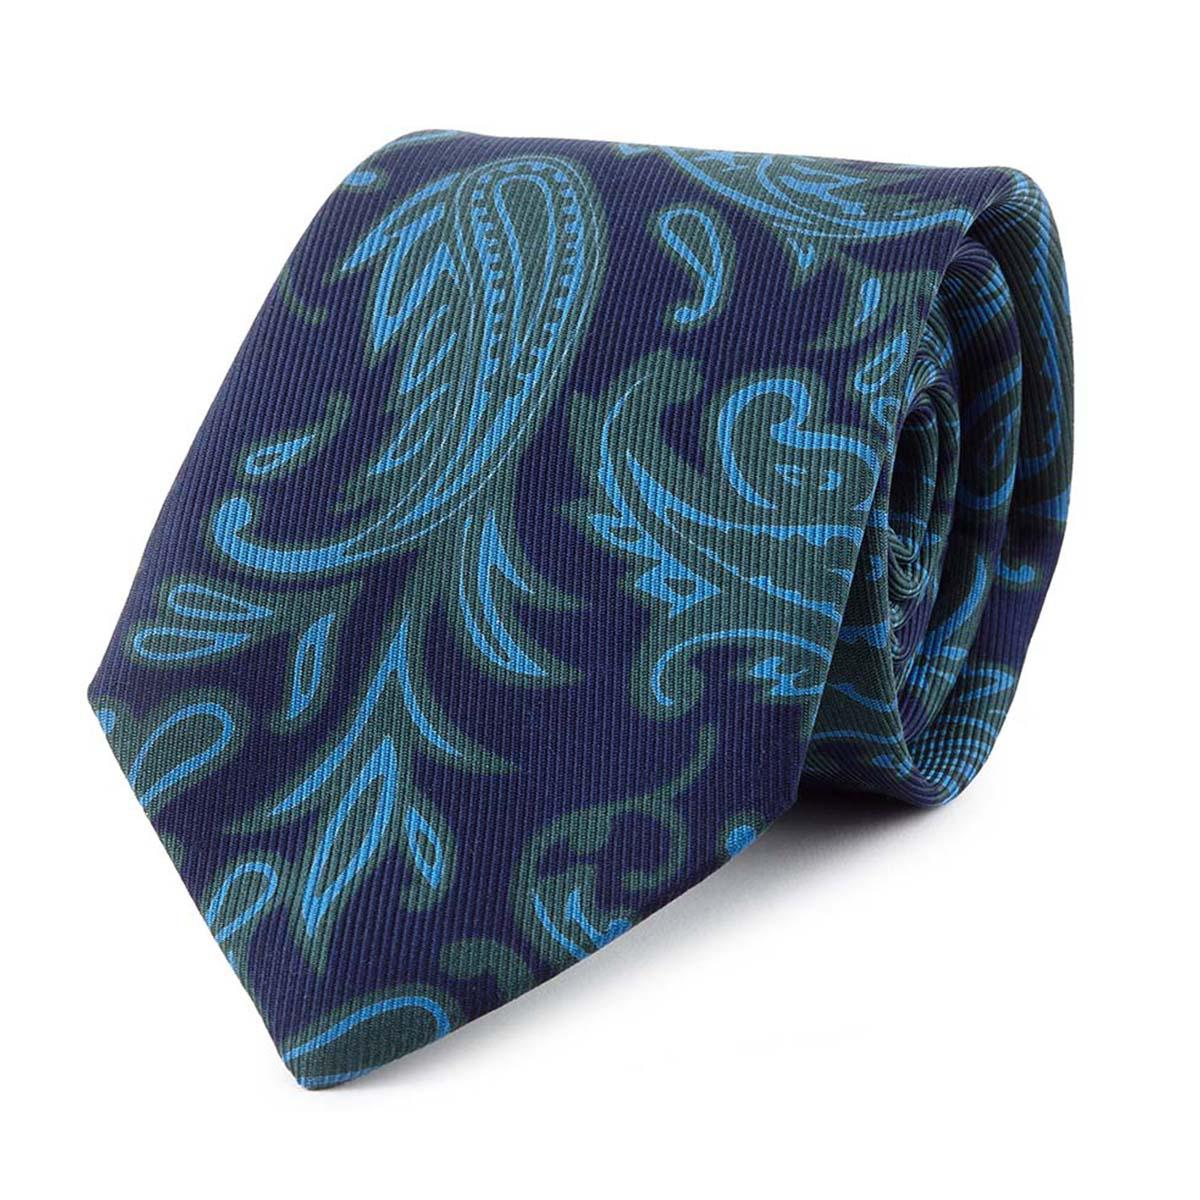 Taupe and Sky Blue Iris Silk Tie Augustus Hare QV4jCr